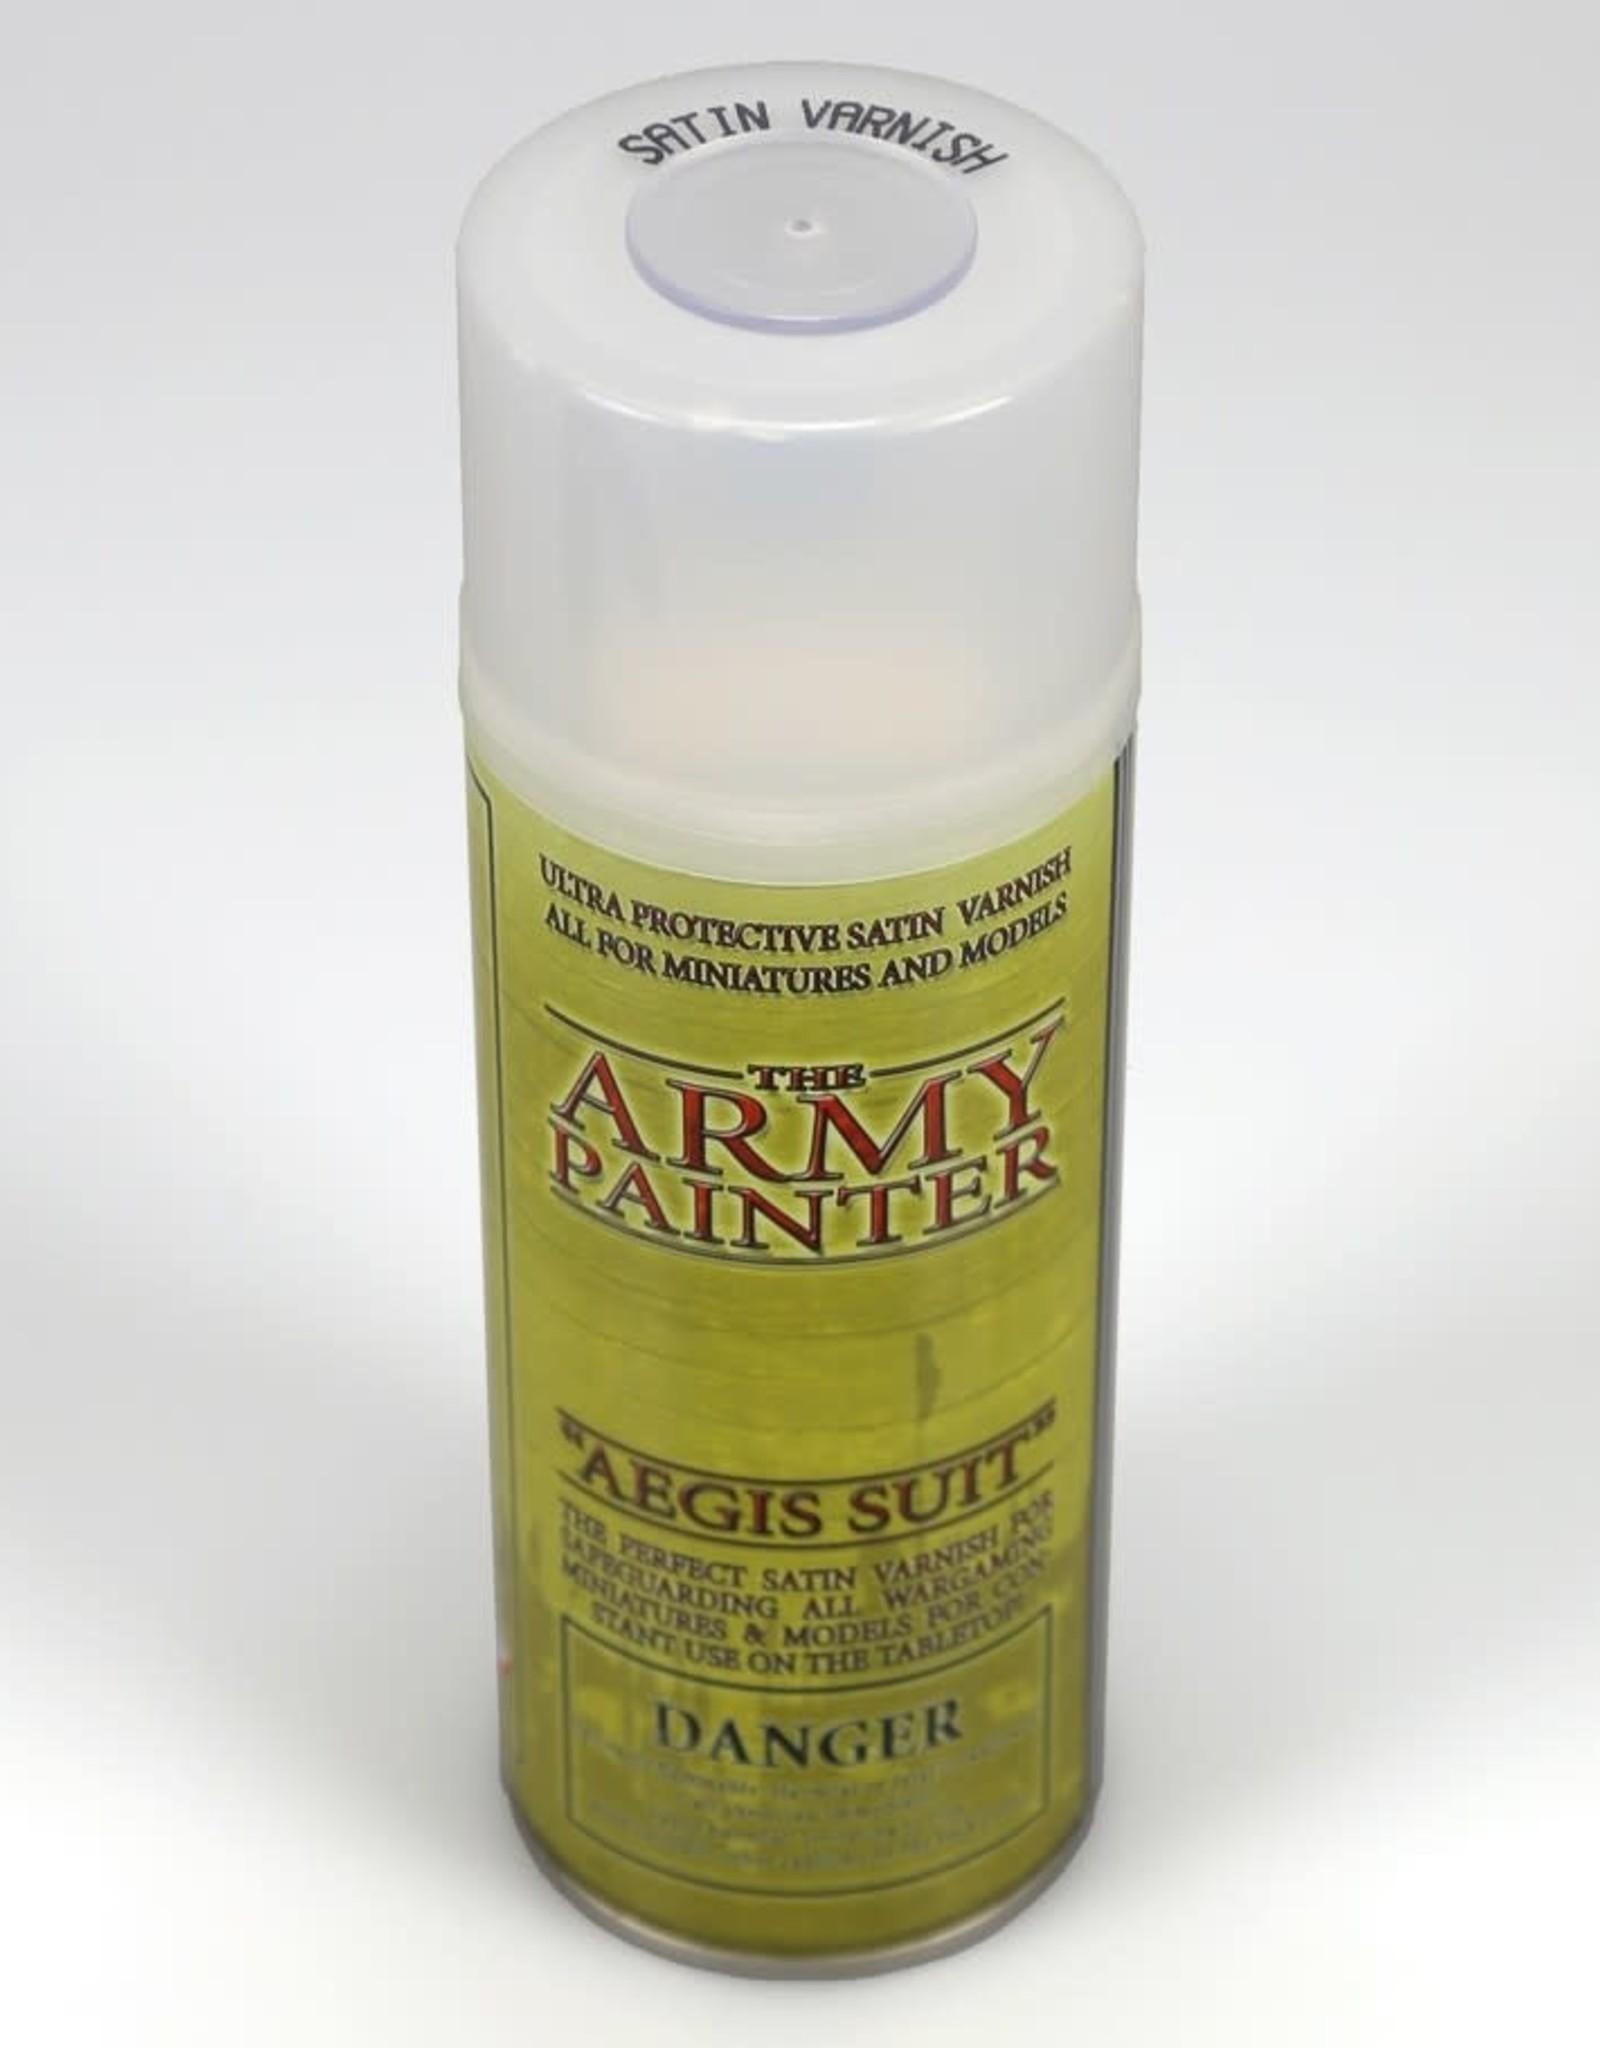 Base Primer: Aegis Suit, Satin Varnish